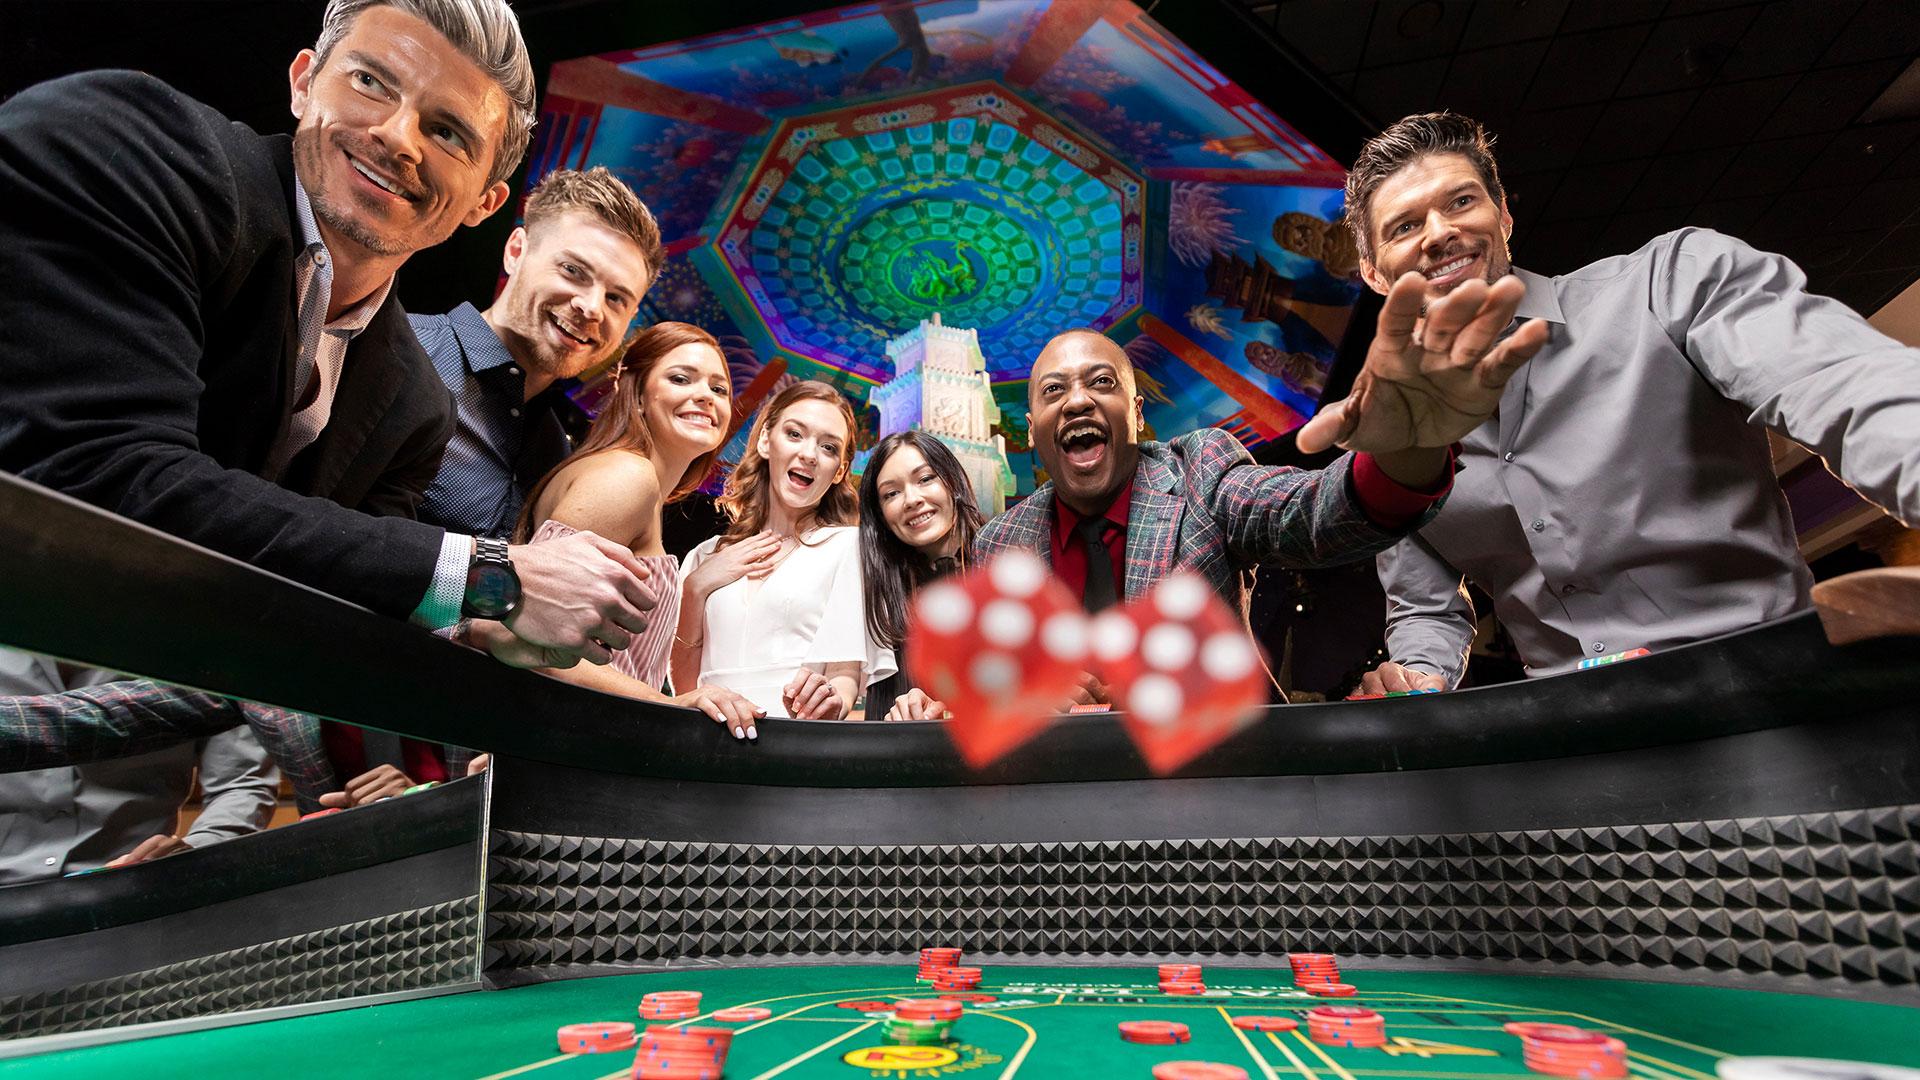 Open storage space for online Casino (คาสิโนออนไลน์).